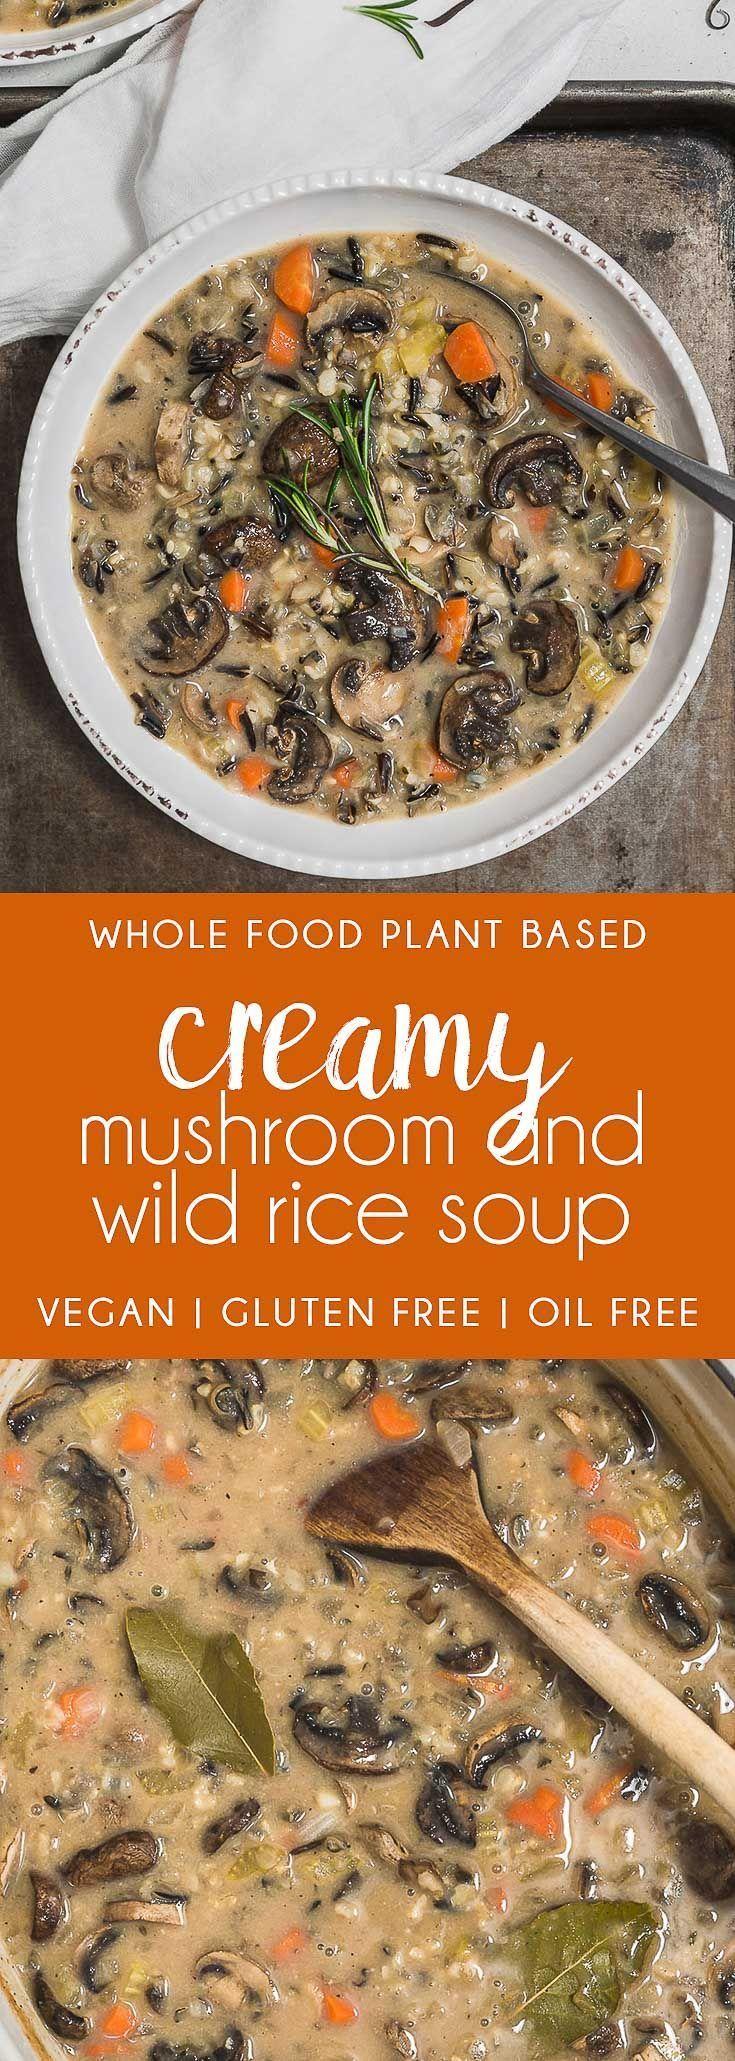 COZY and FLAVORFUL Creamy Mushroom and Wild Rice Soup! Healthy and satisfying! #vegan #glutenfree #oilfree #soup #mushroom #wildrice #plantbased #refinedsugarfree #healthy #healthyvegan #monkeyandmekitchenadventures #recipe